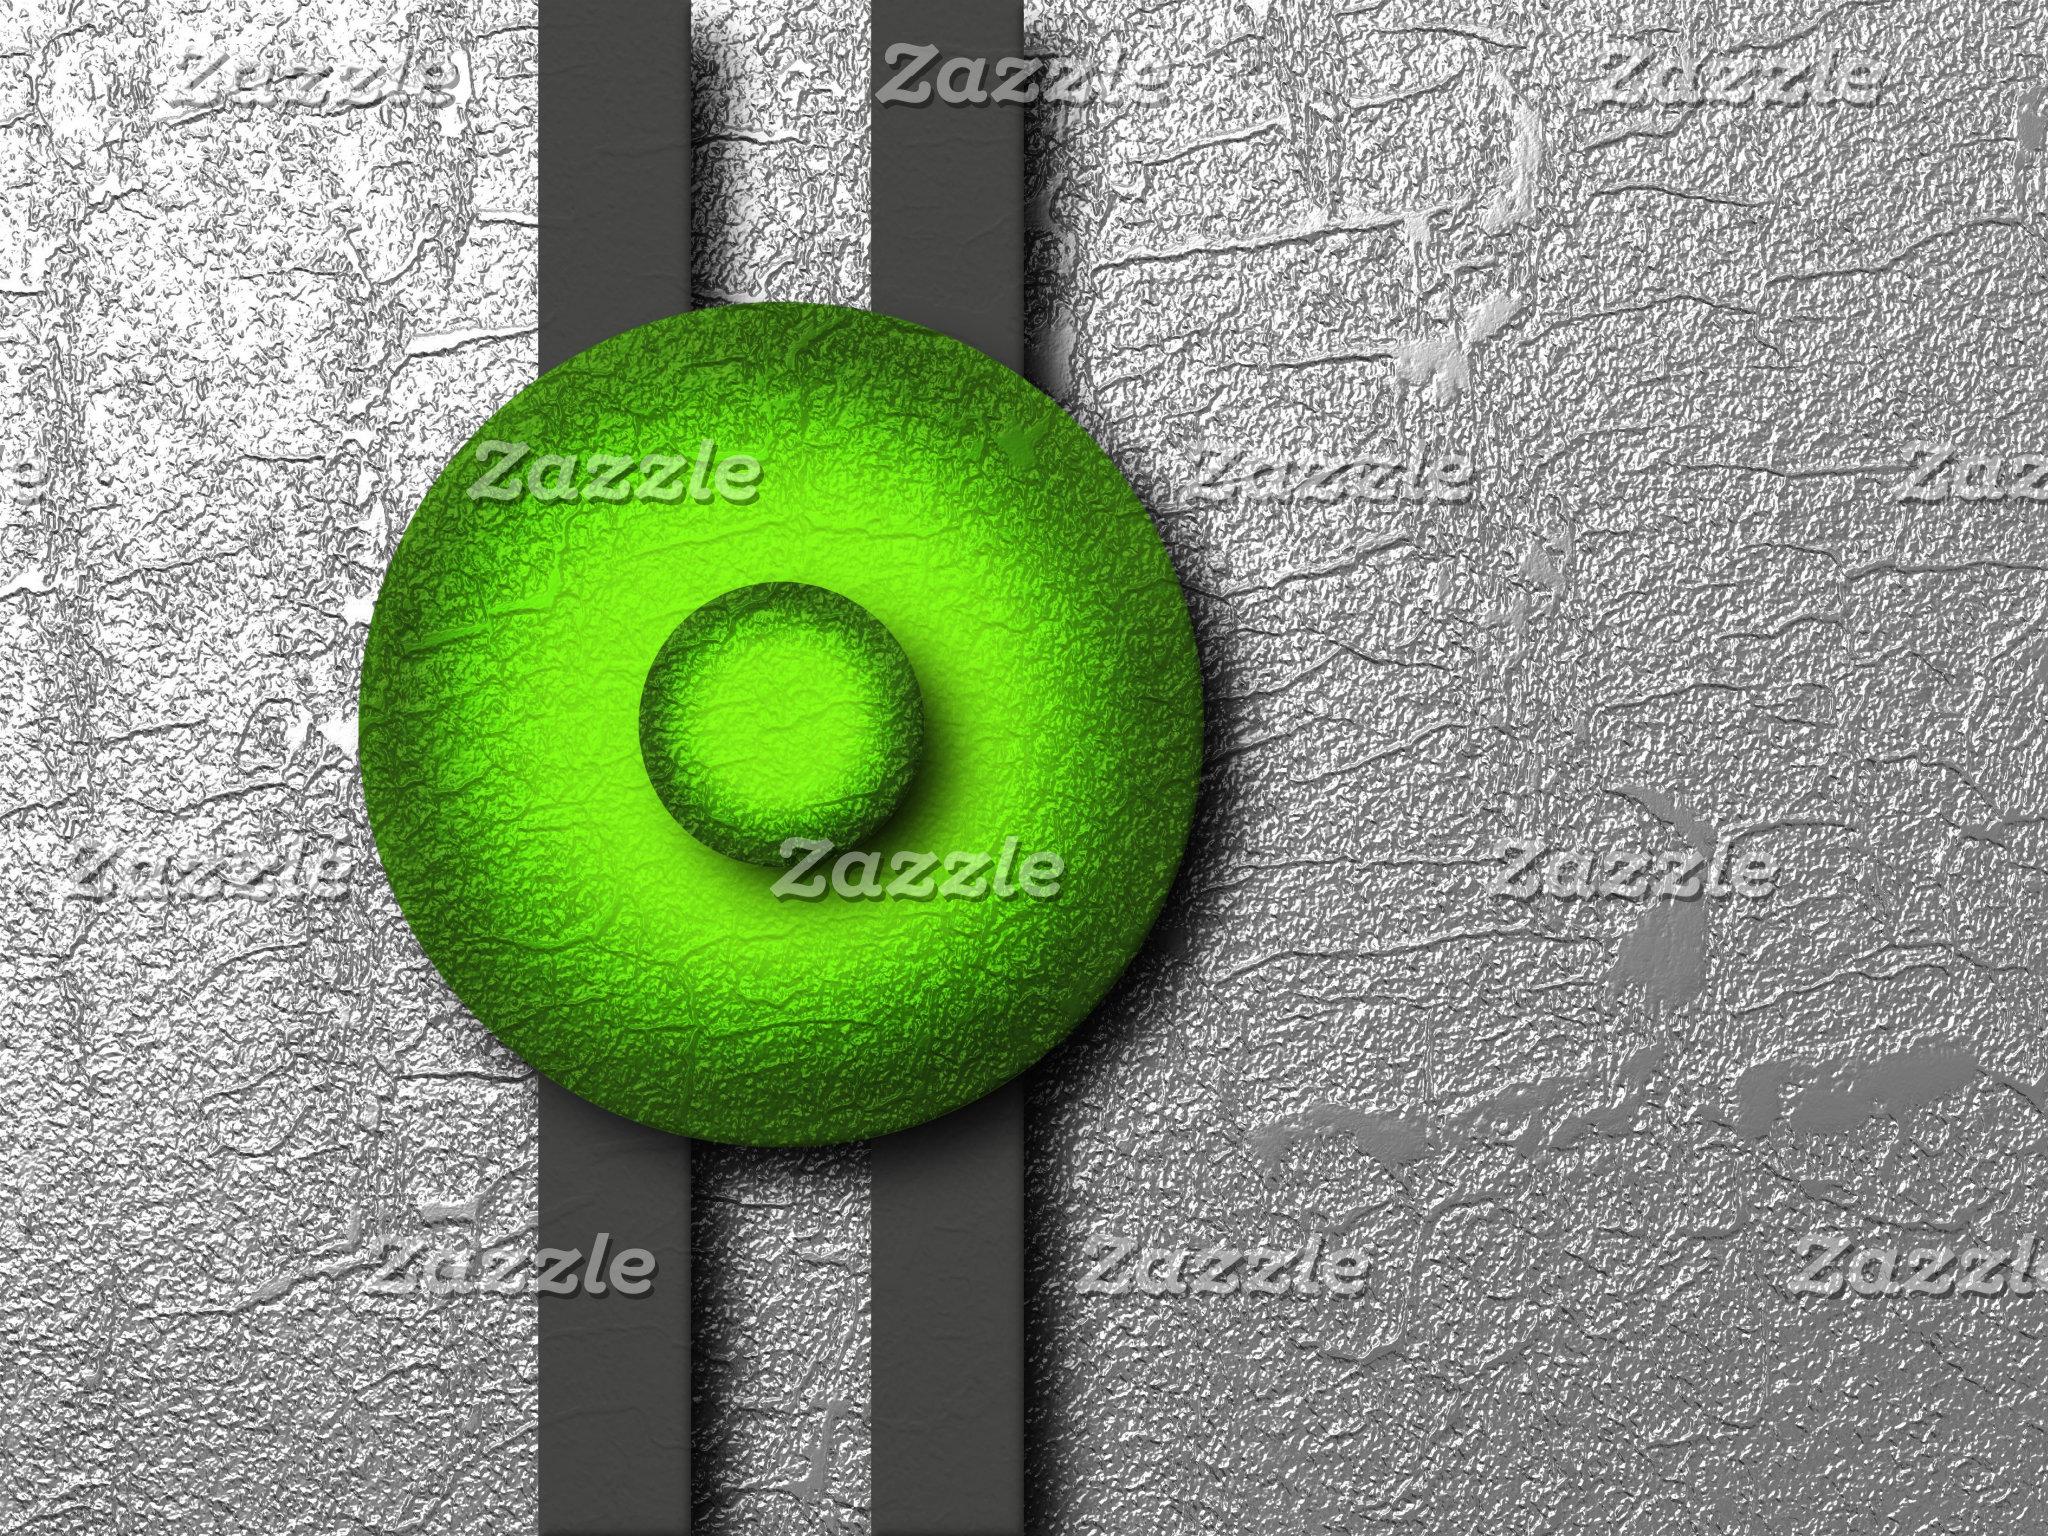 Buttons-Magnete-Sticker-Aufkleber